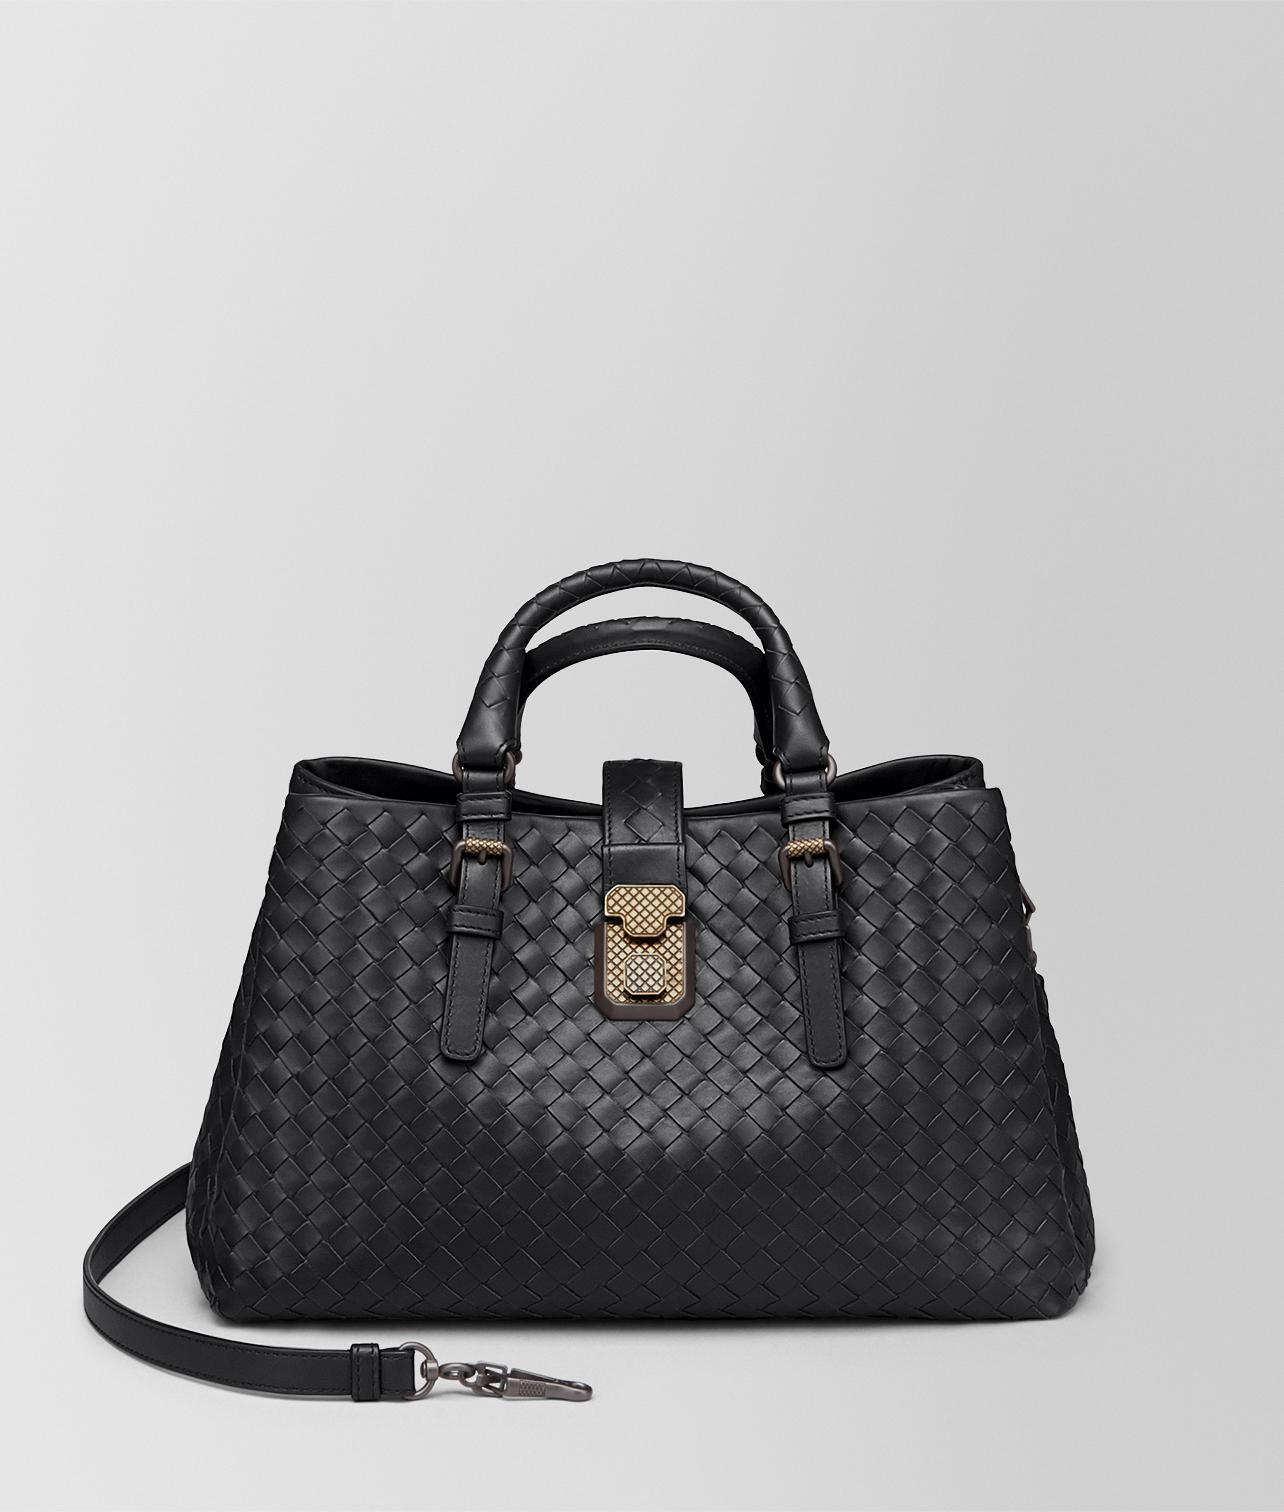 f391142850c9 Bottega Veneta Nero Intrecciato Calf Small Roma Bag in Black - Lyst